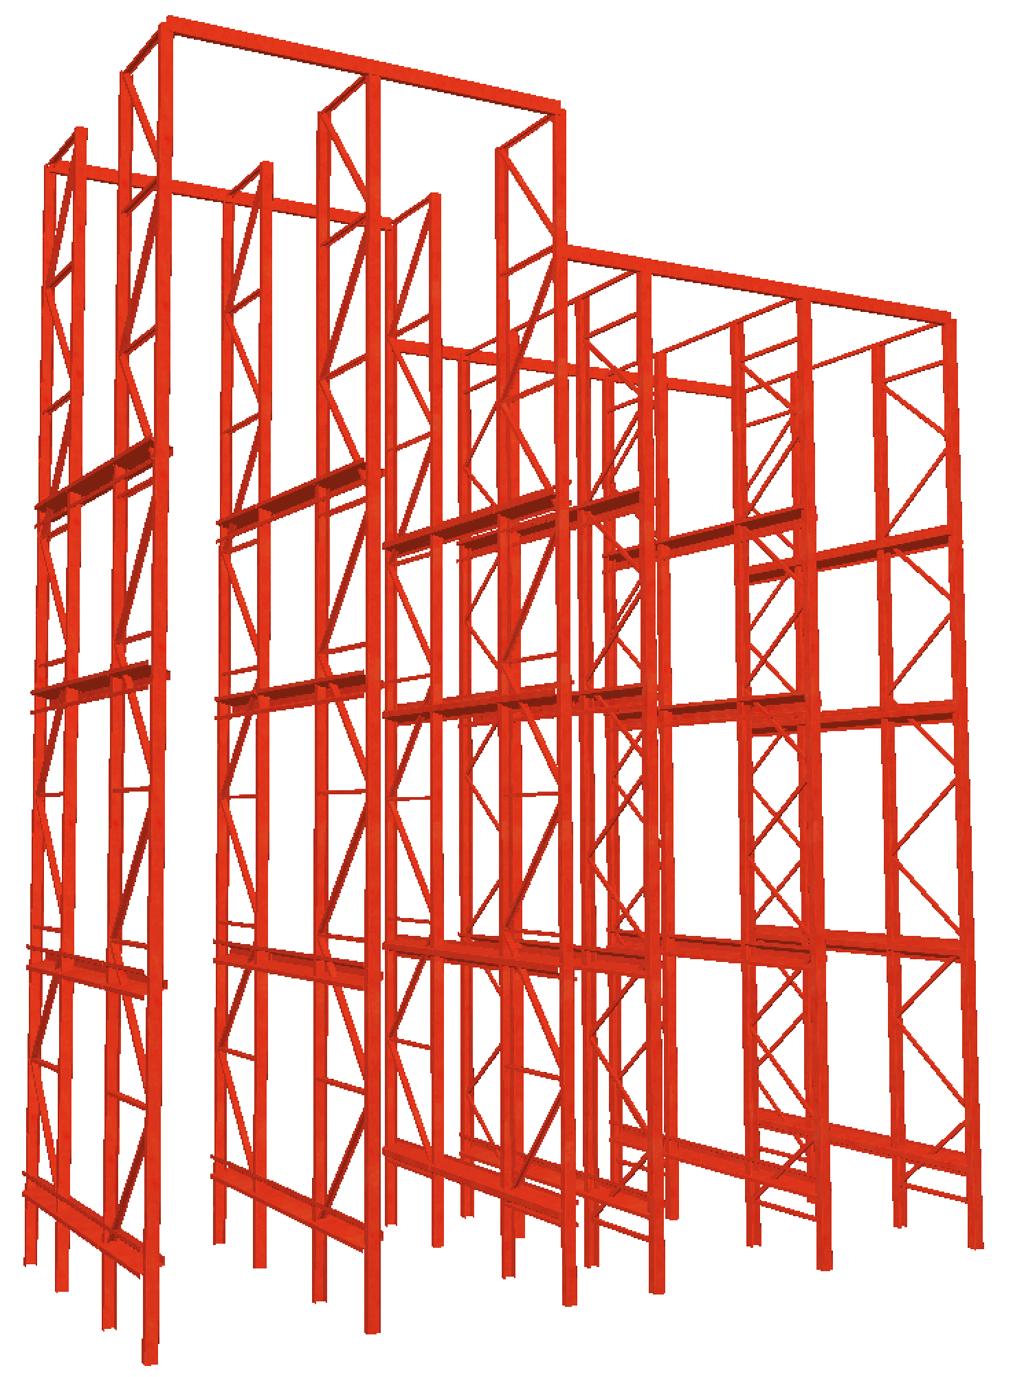 diseño estanteria metalica inspeccion ite